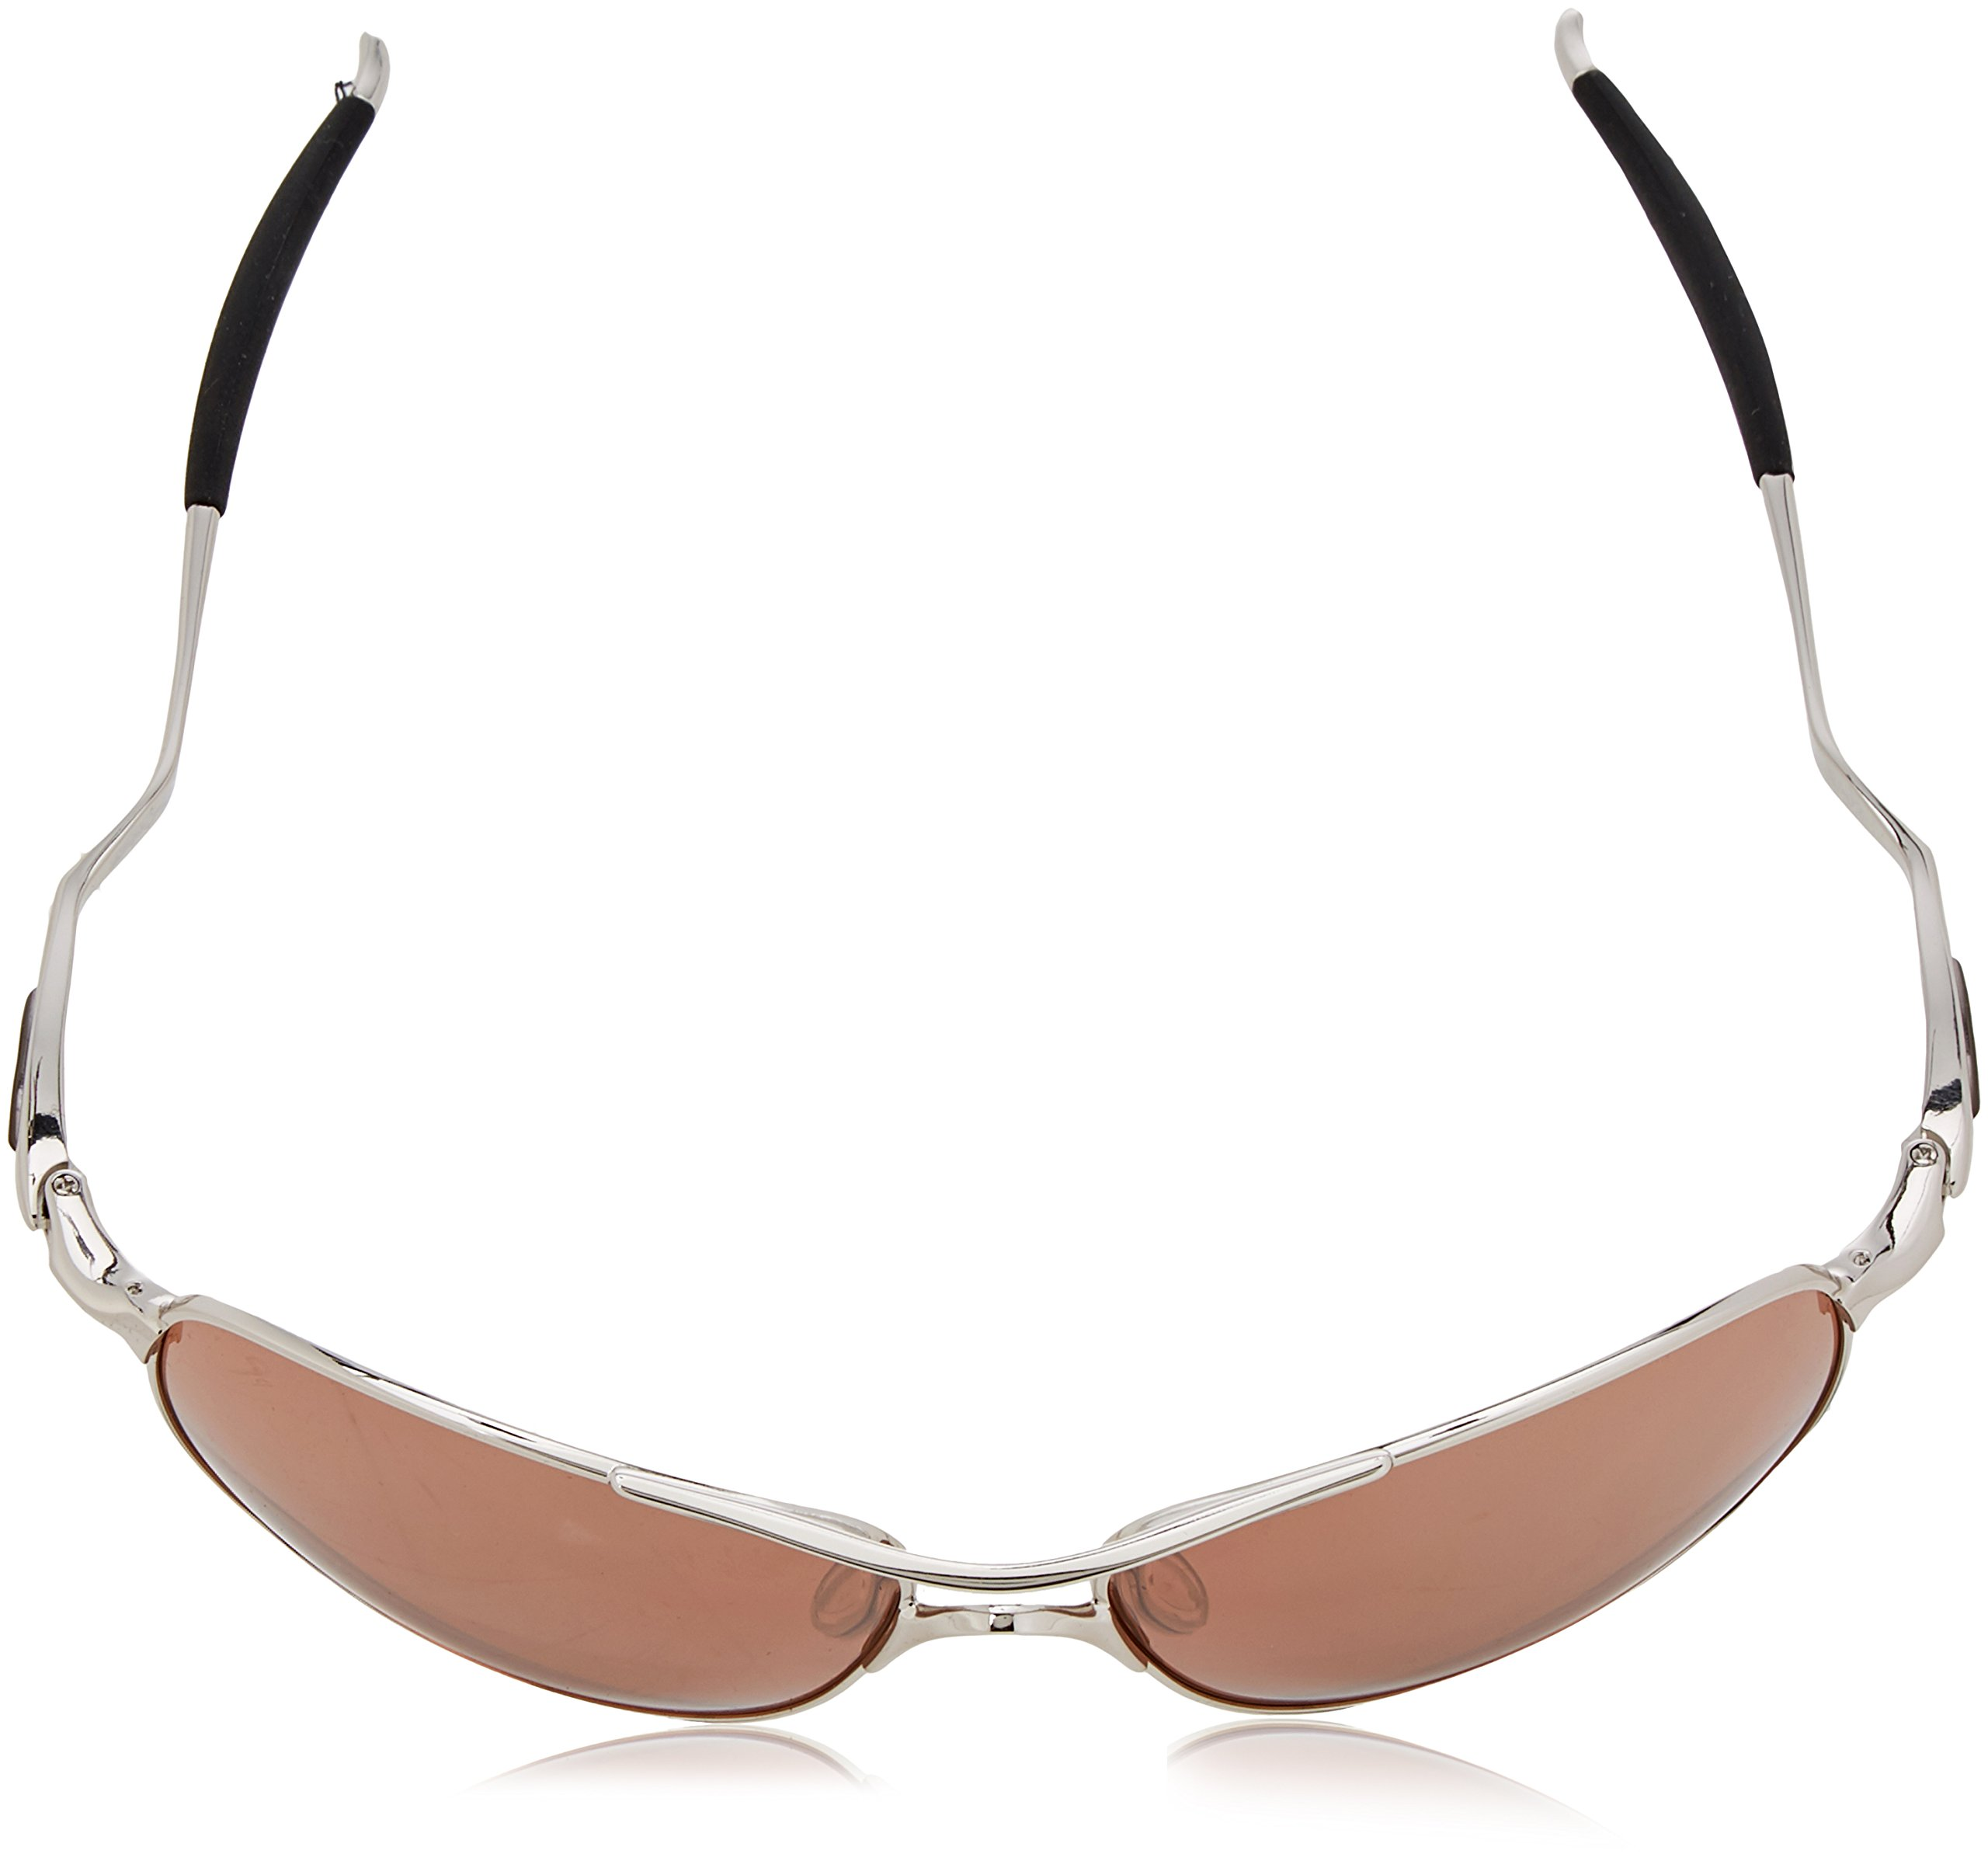 Oakley Mens Crosshair OO4060-02 Iridium Non-Polarized Oval Sunglasses,Chrome Frame/VR28 Black Iridium Lens,one size by Oakley (Image #4)